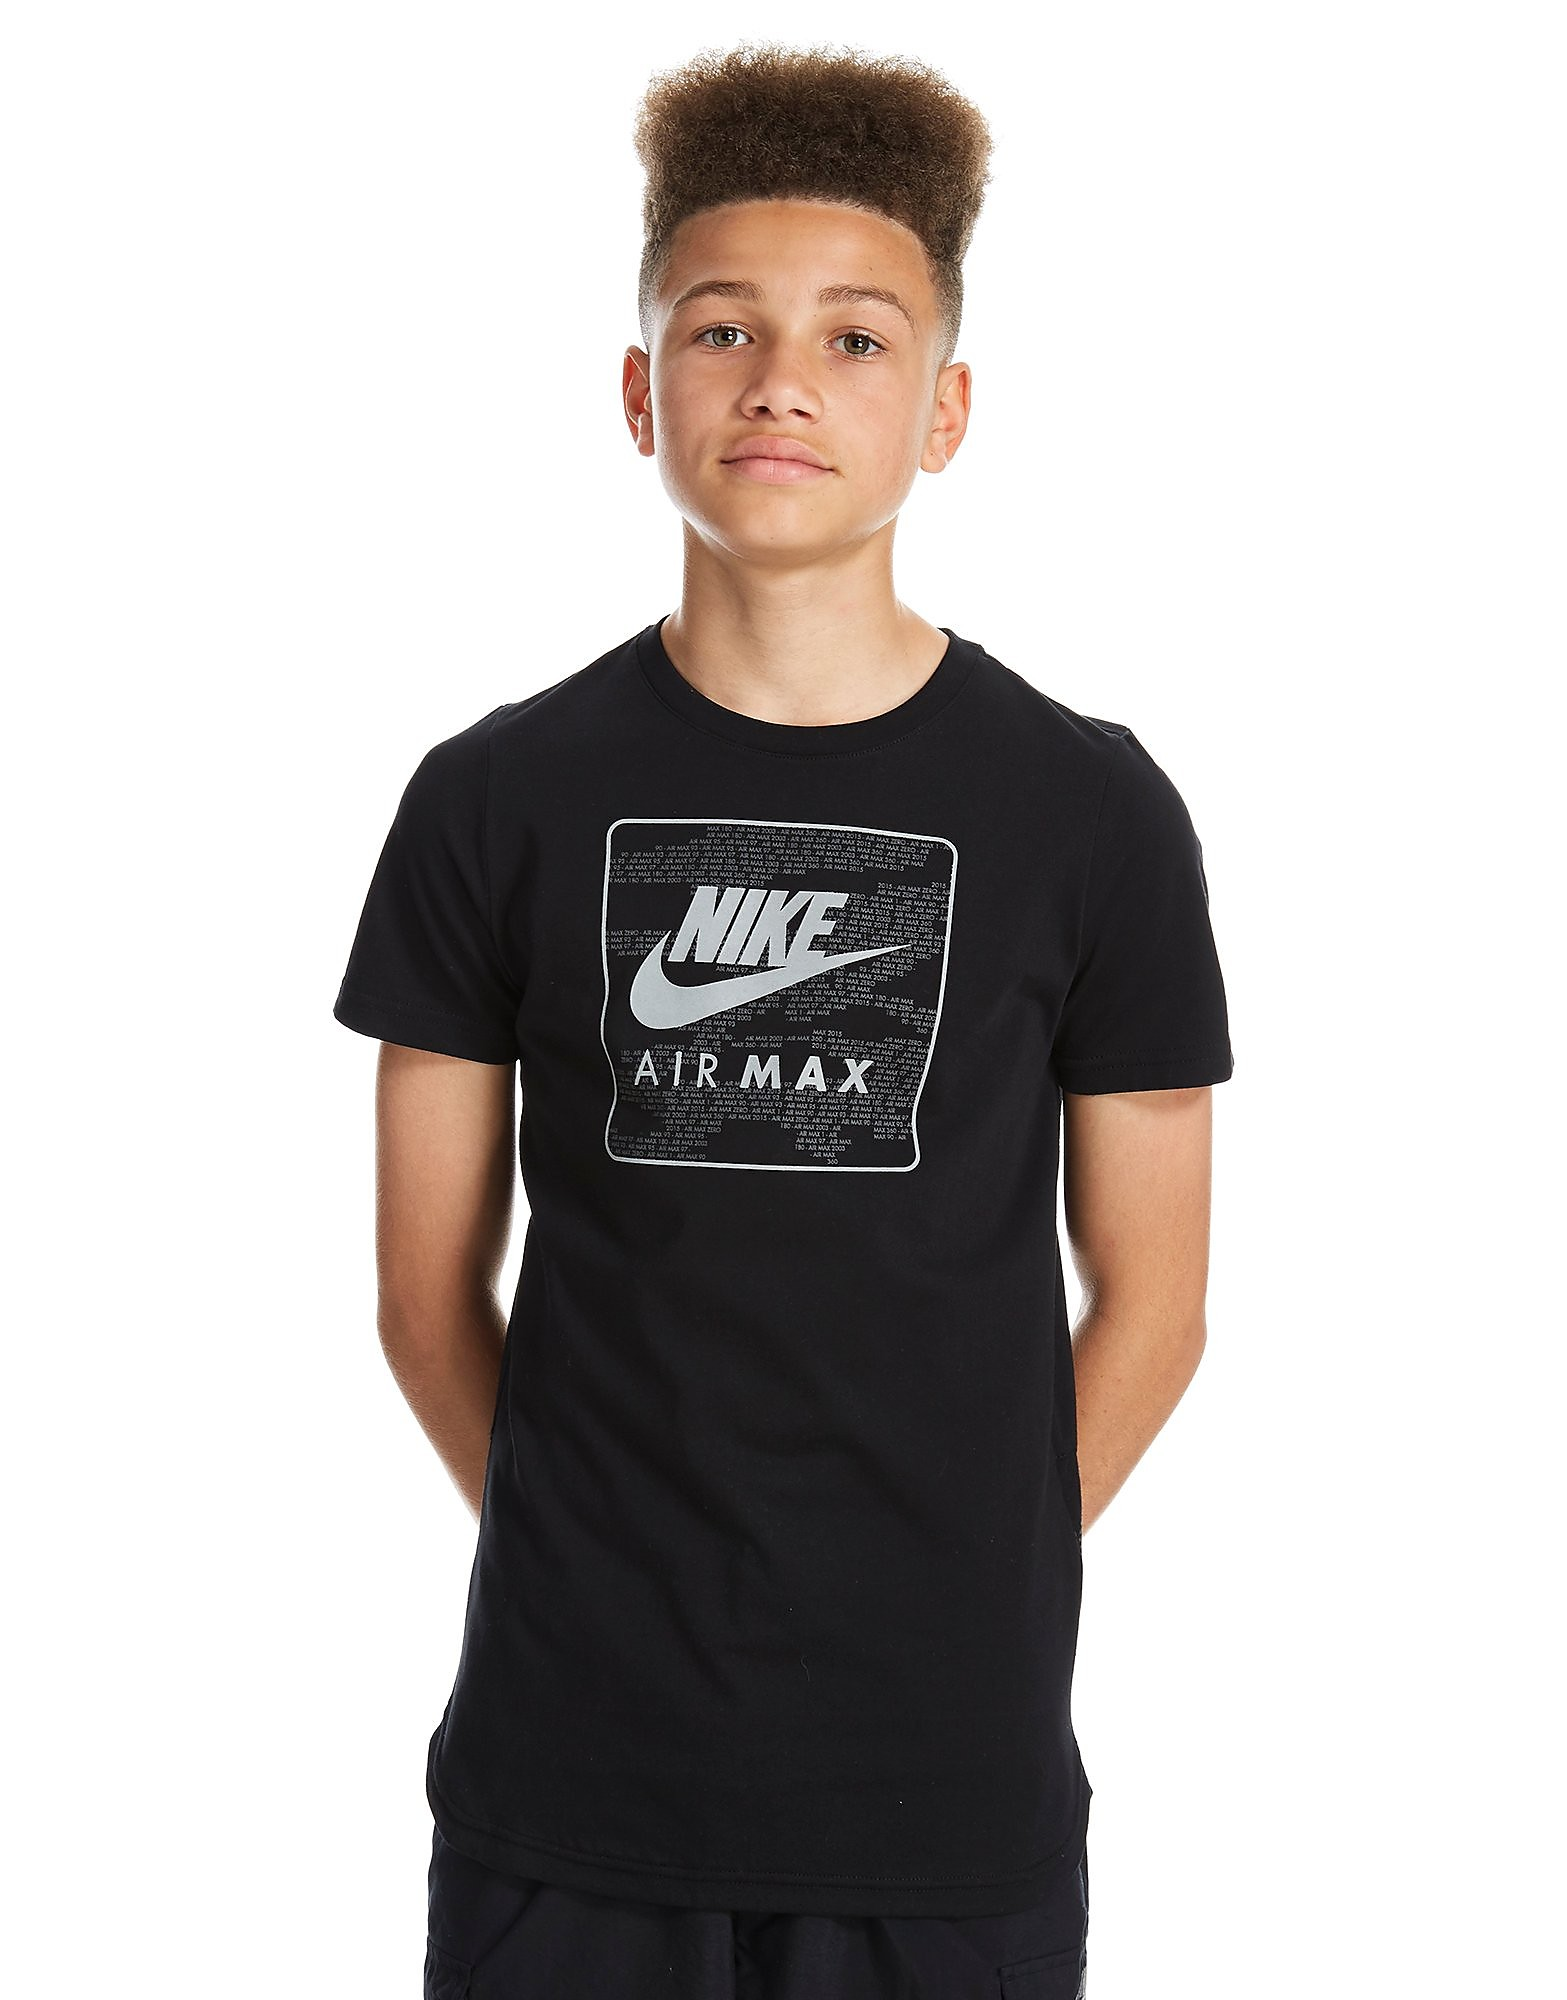 Nike T-shirt Max Cut & Sew Enfant